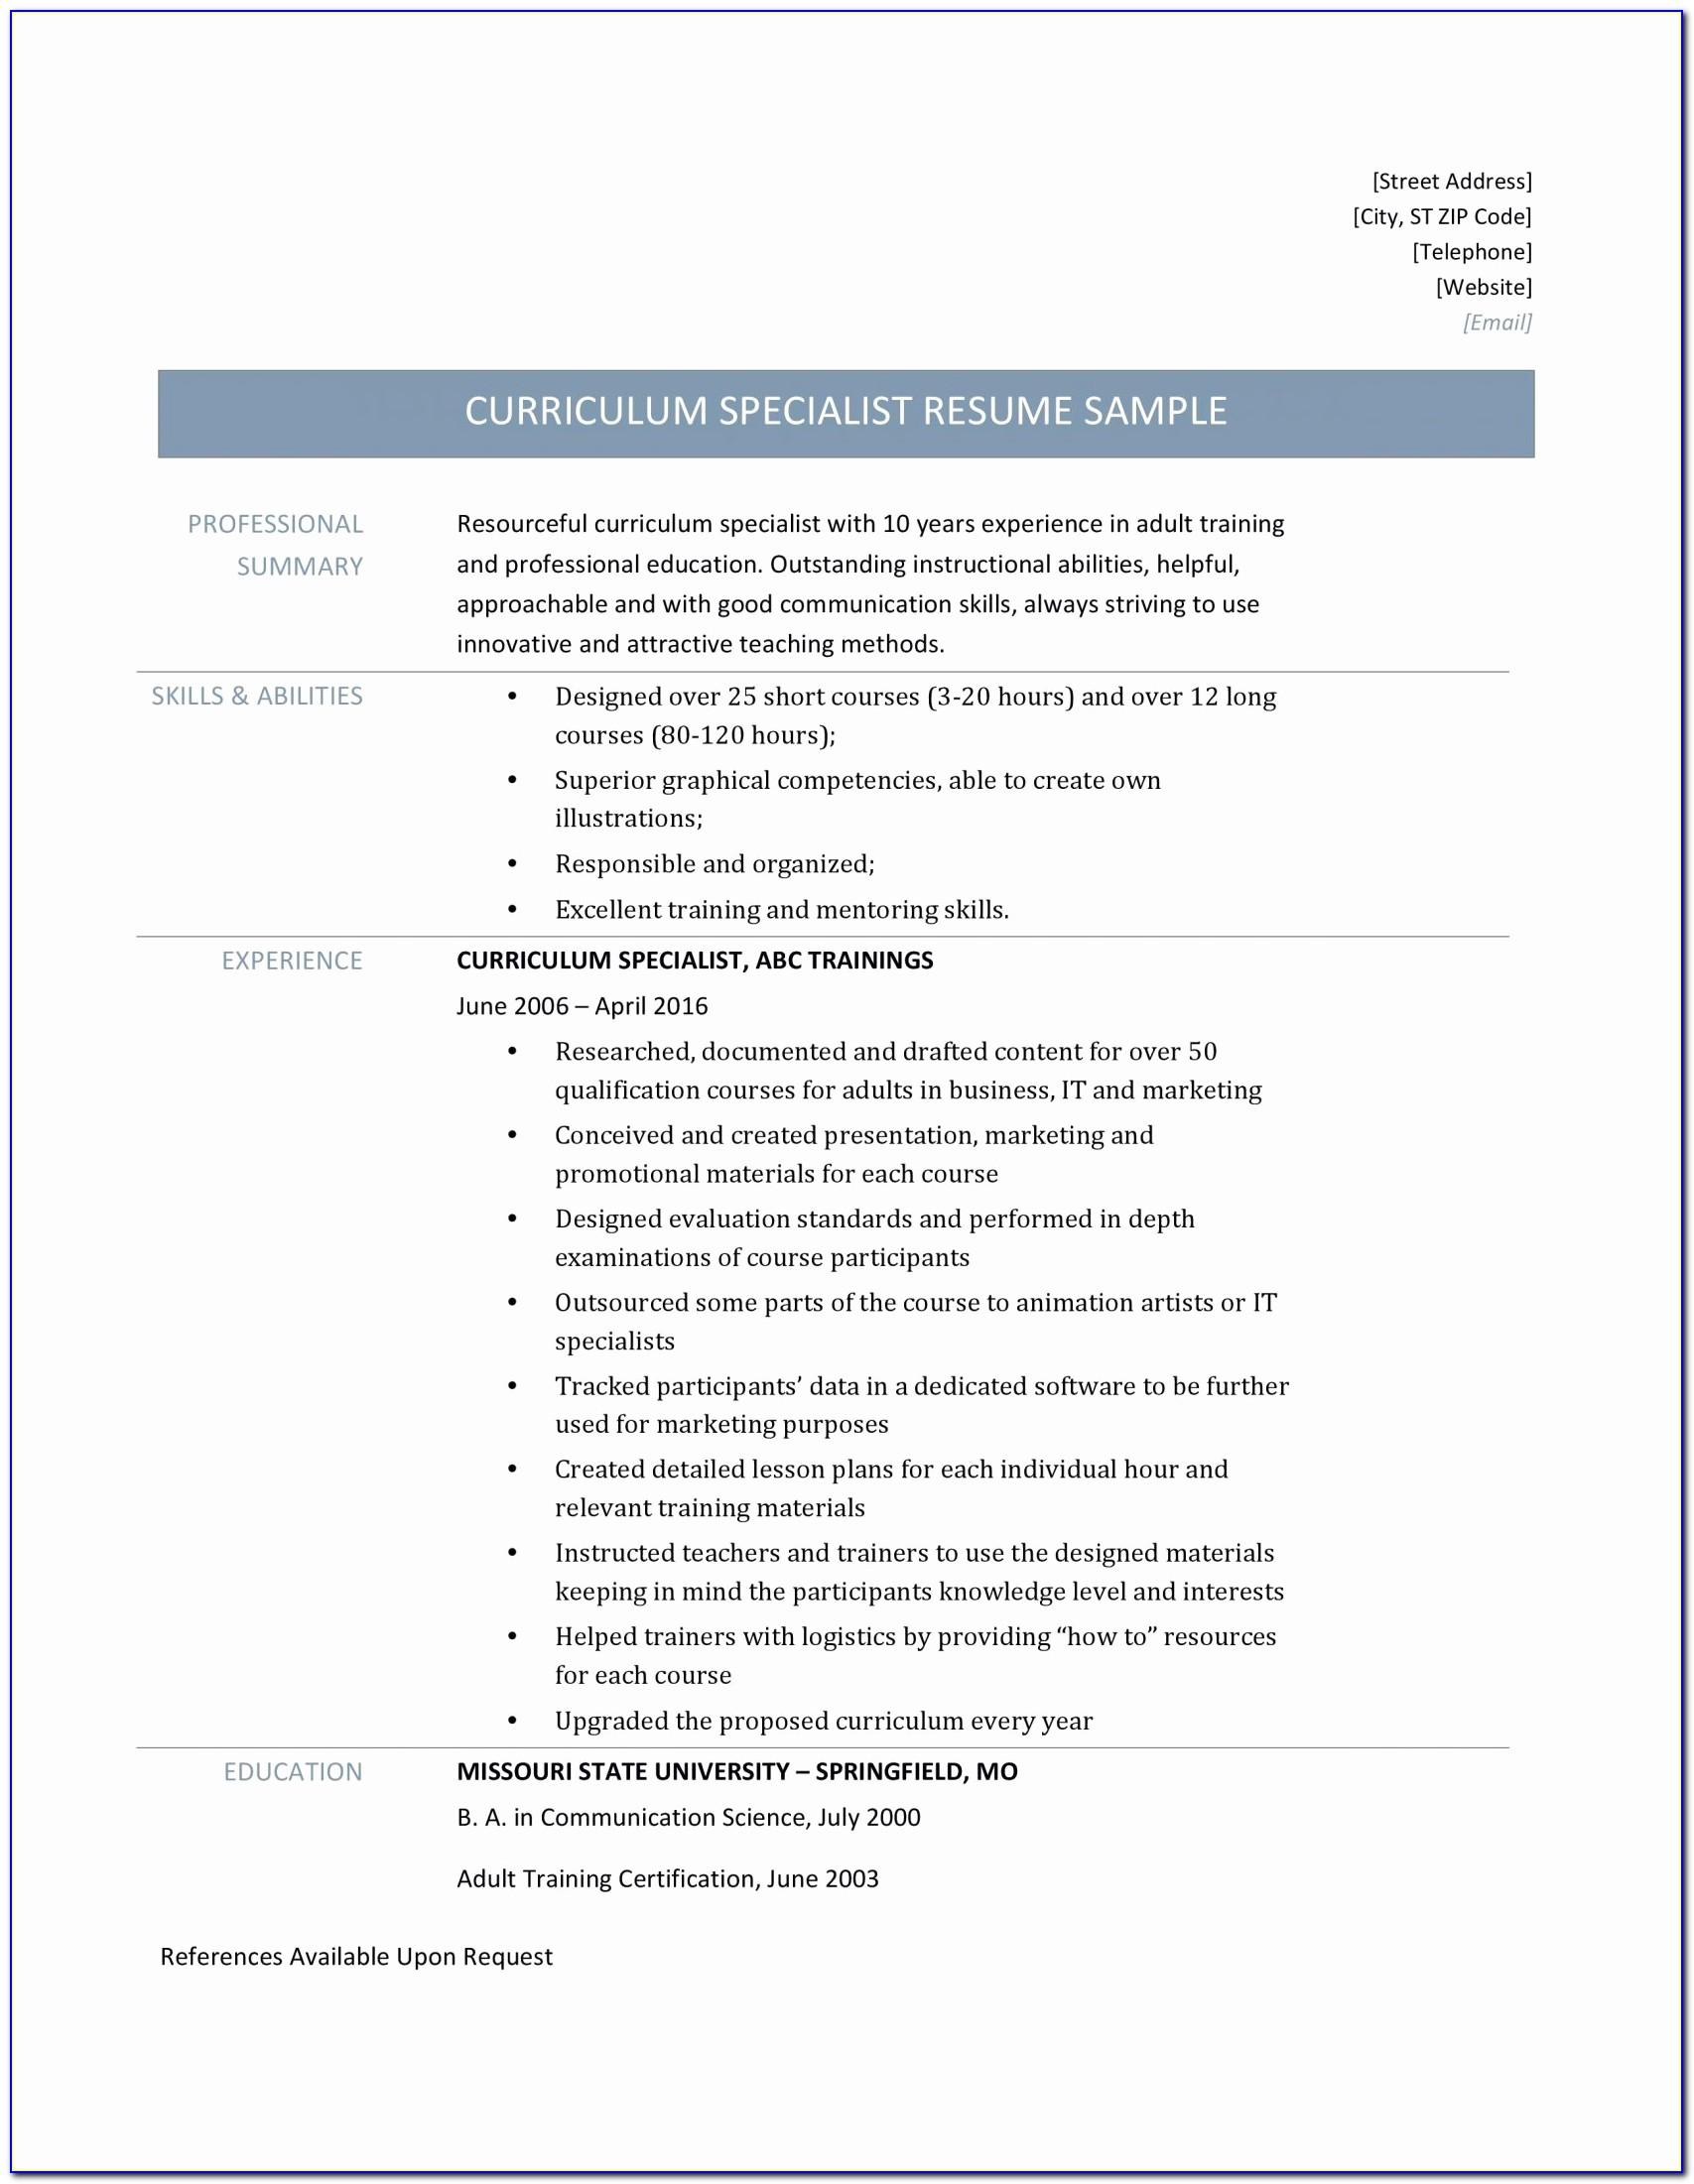 Resume For Medical Transcriptionist Unique Resume Medical Transcriptioniste No Experience Coding Cover Letter